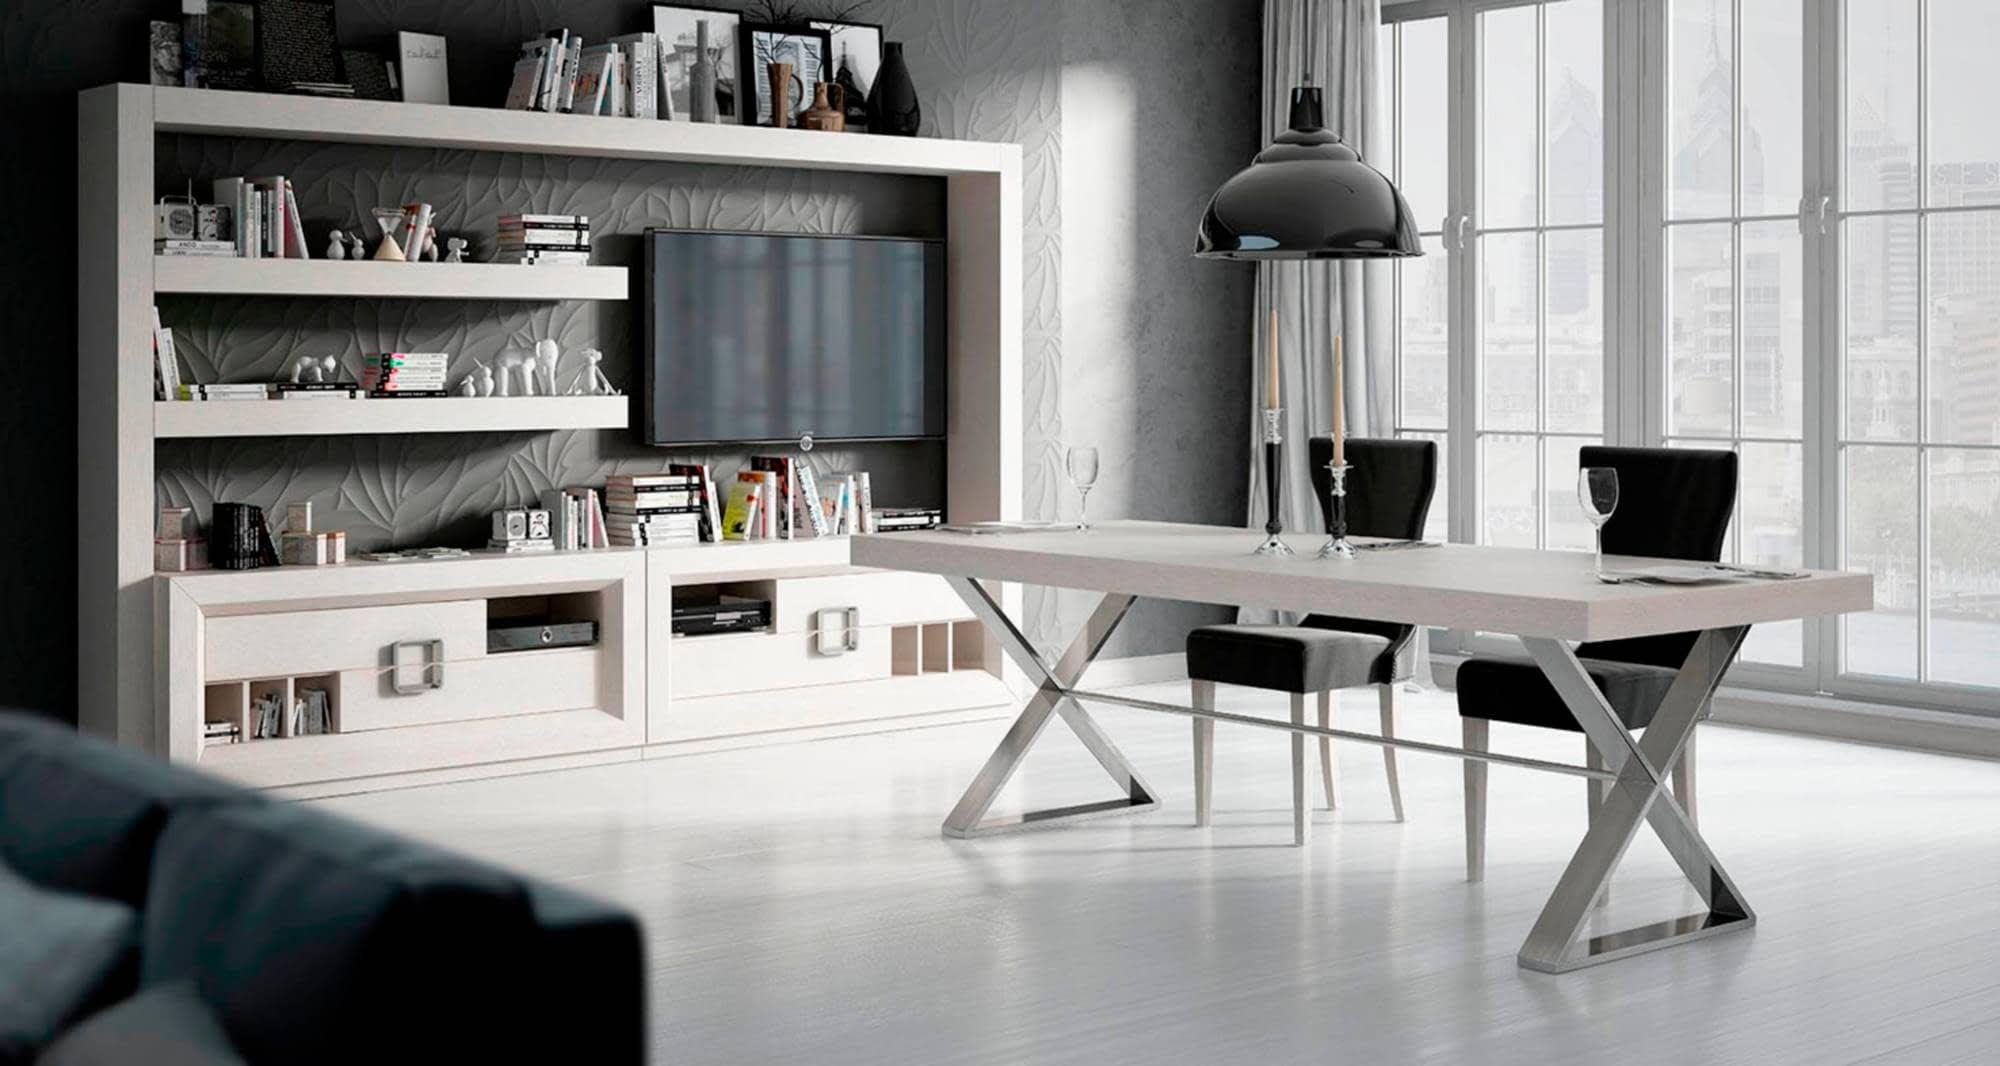 muebles turiaso obtenga ideas dise o de muebles para su